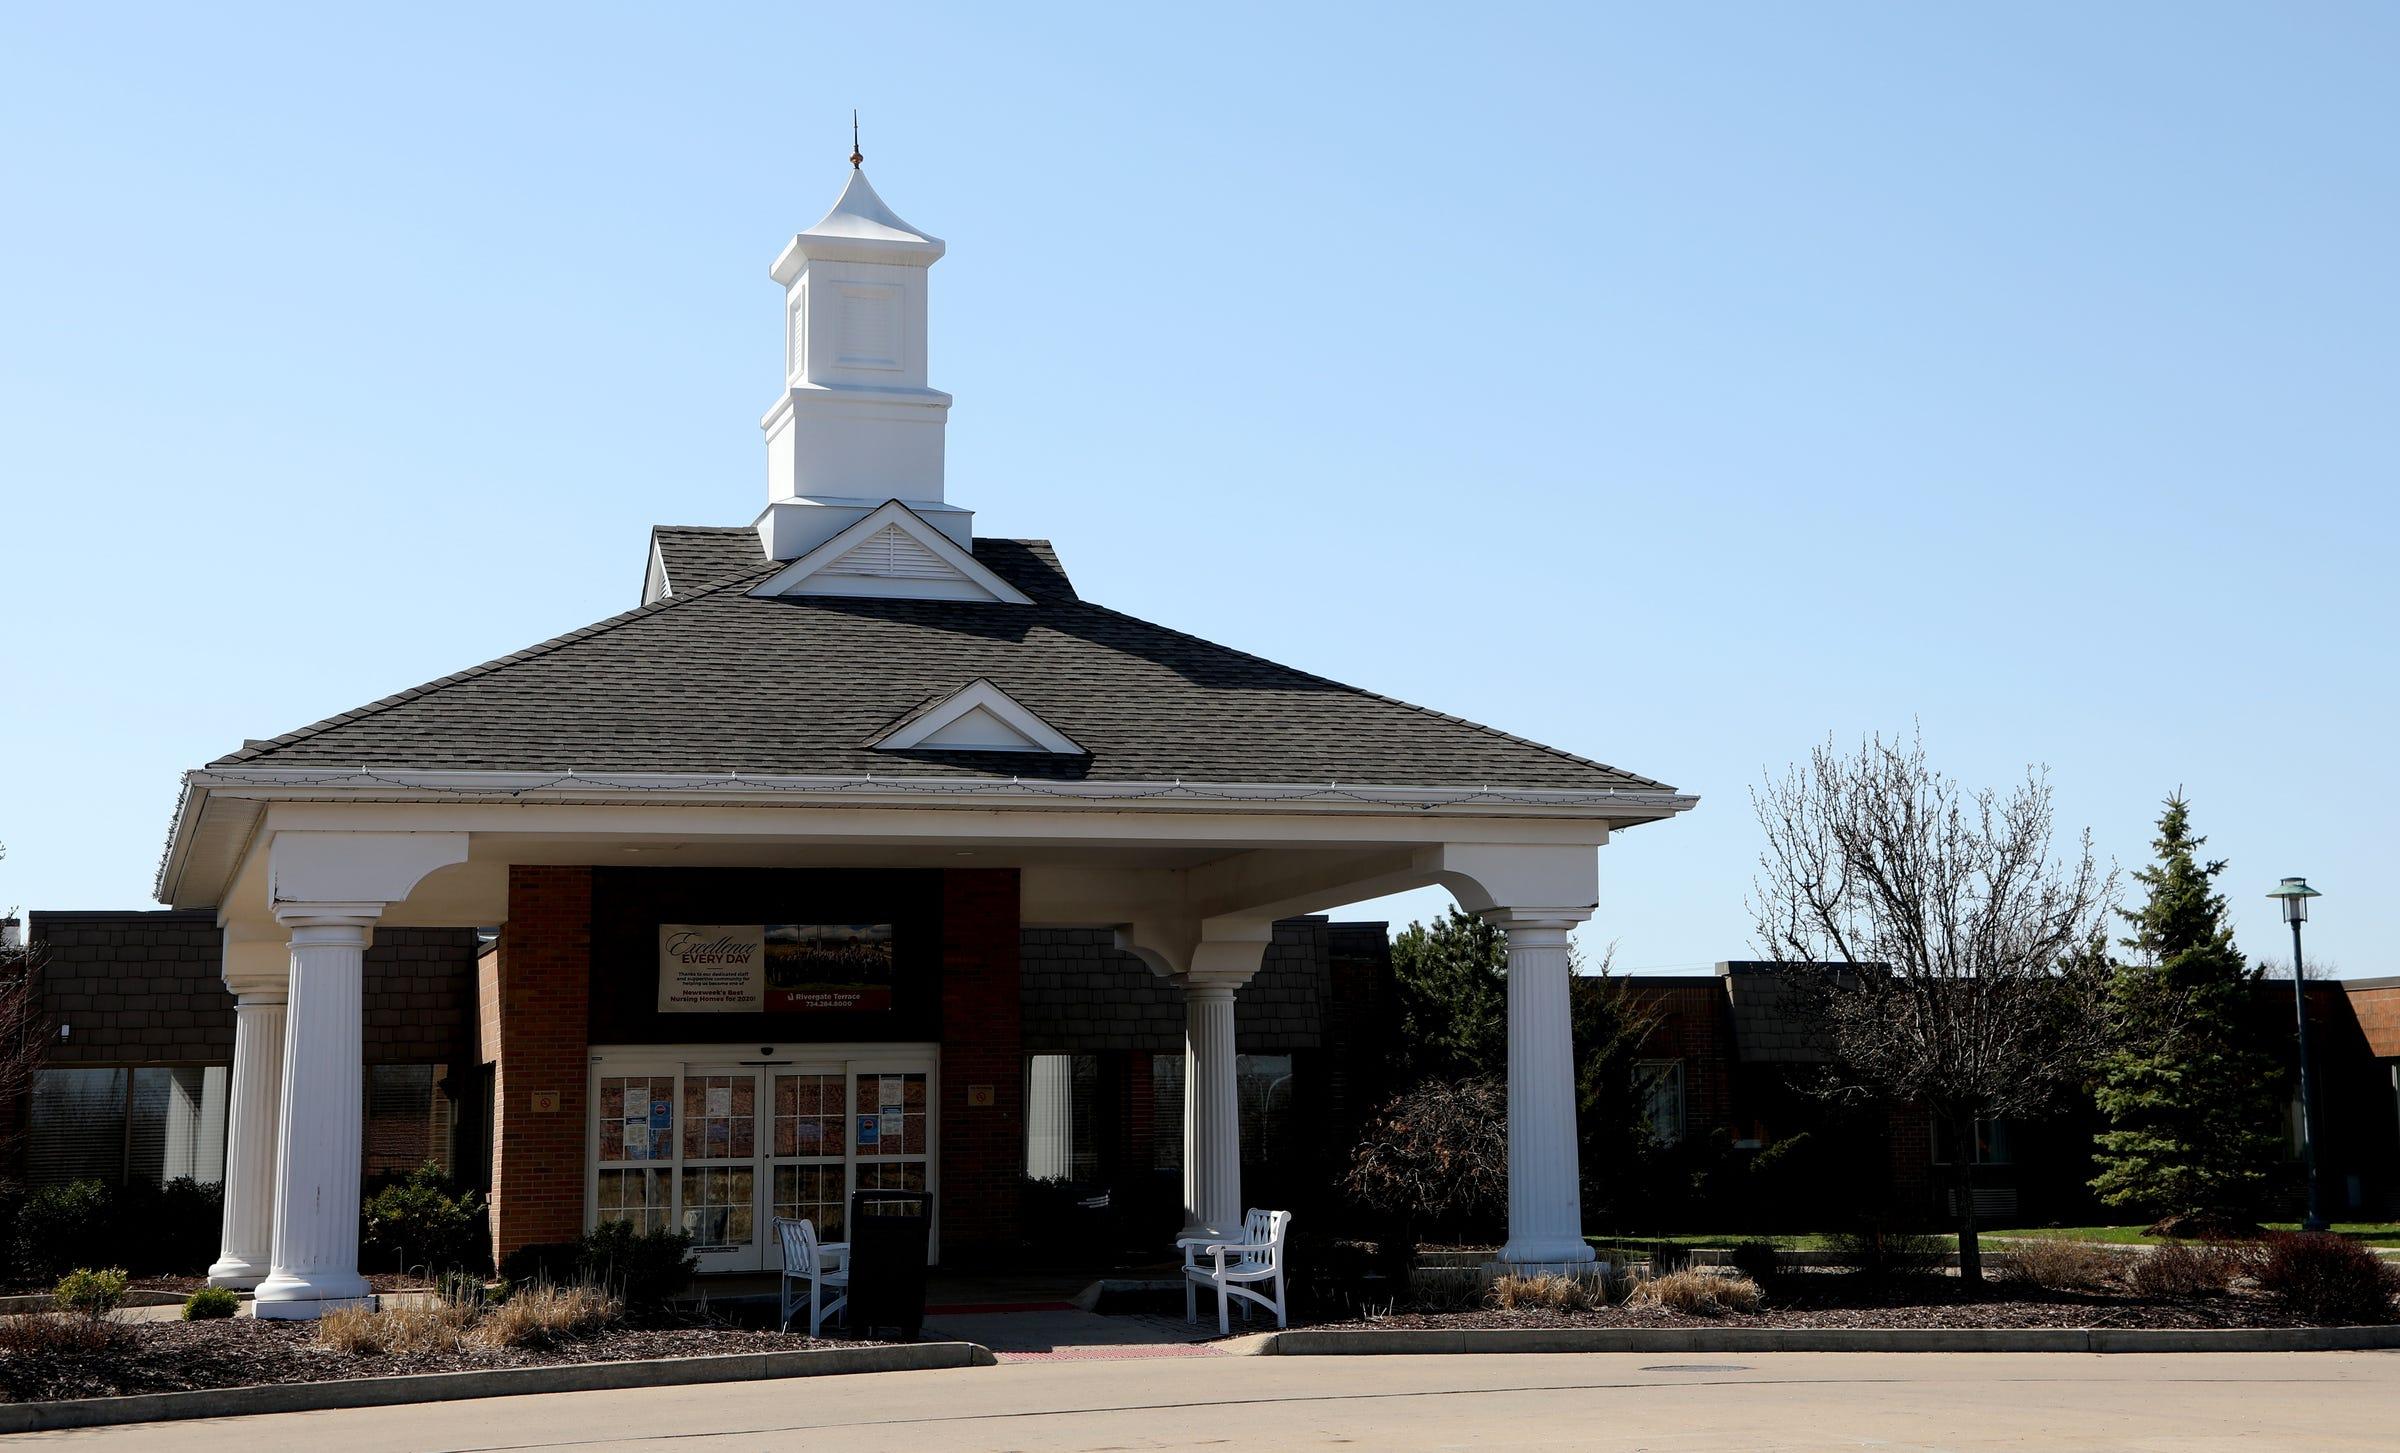 Rivergate Terrace Skilled Nursing and Rehabilitation Center in Riverview, Michigan.